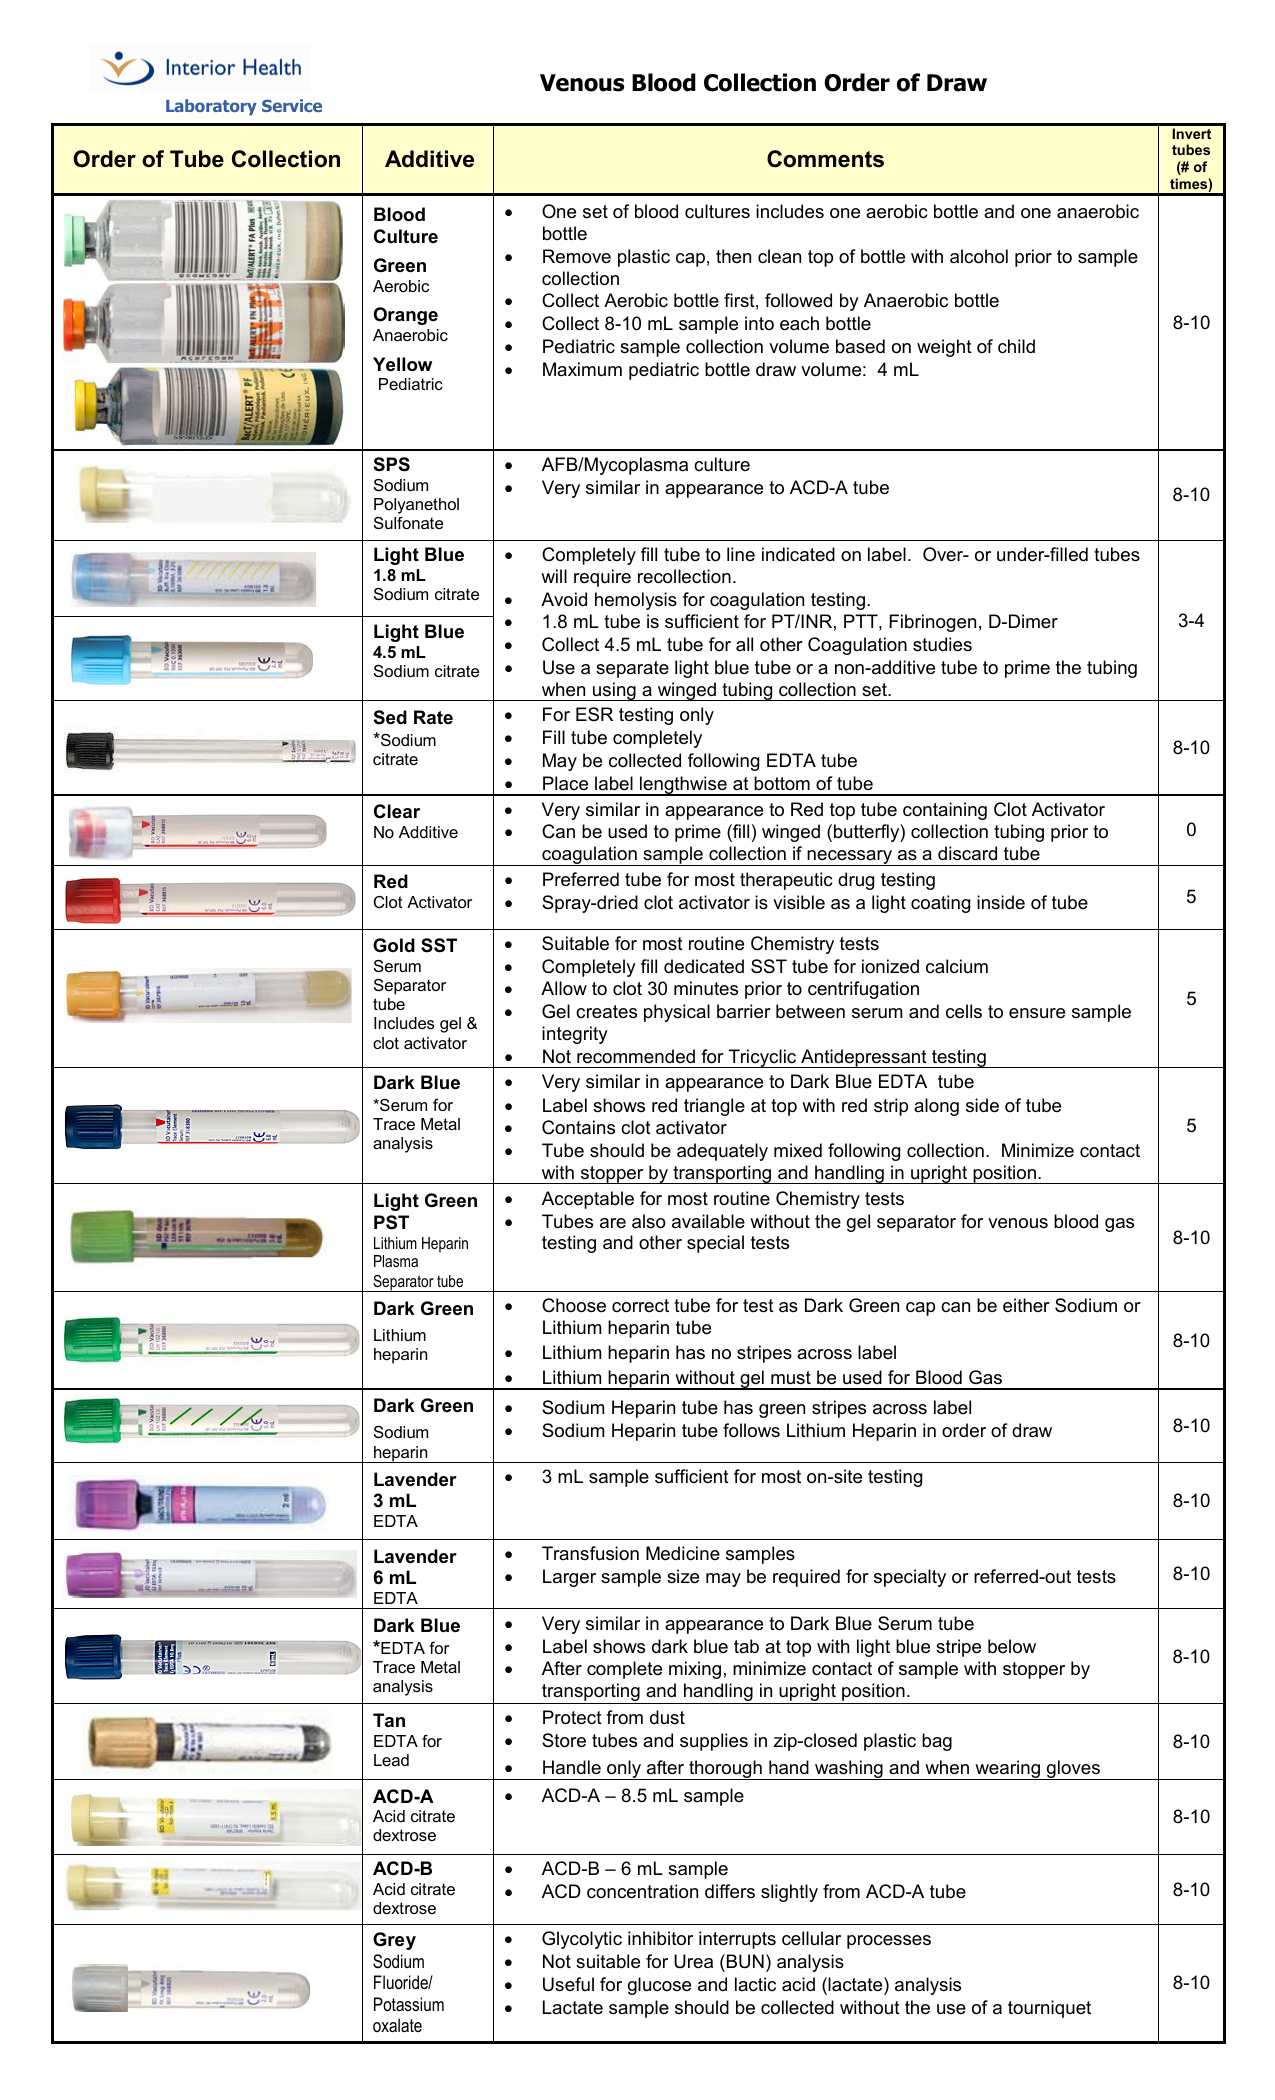 vch regional laboratory medicine: phlebotomy quick reference